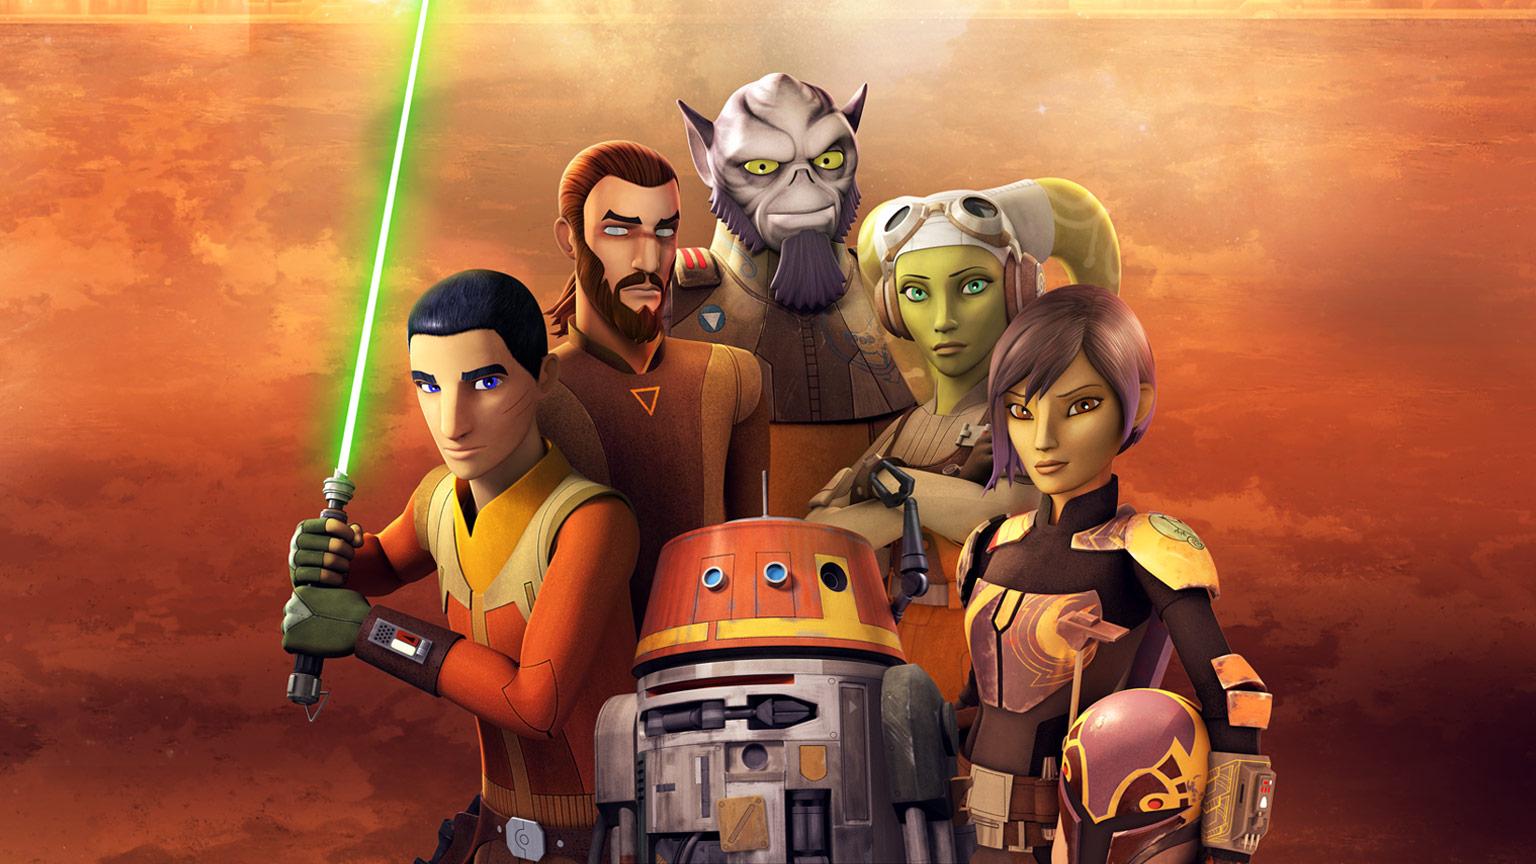 Star Wars: Rebels' ganhará um art book - Quarto Nerd